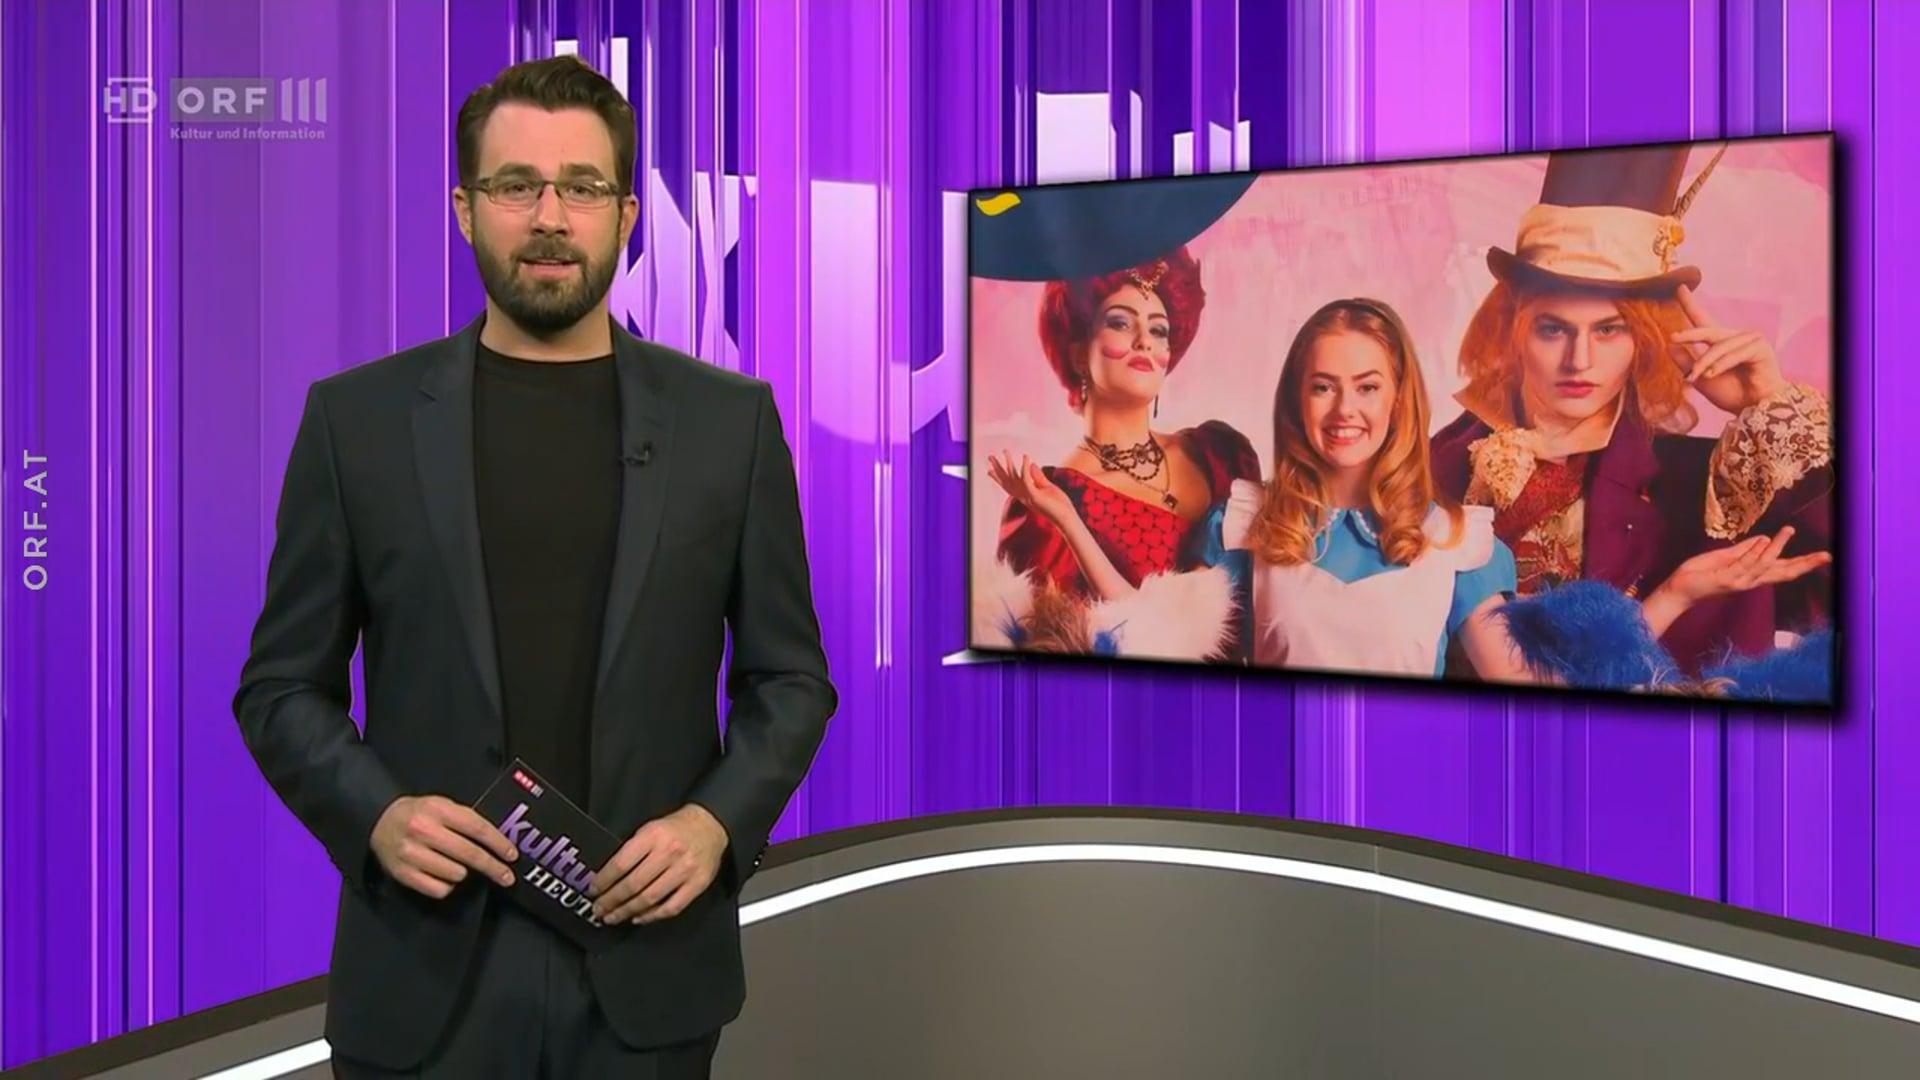 ORF III Alice im Wunderland Bericht